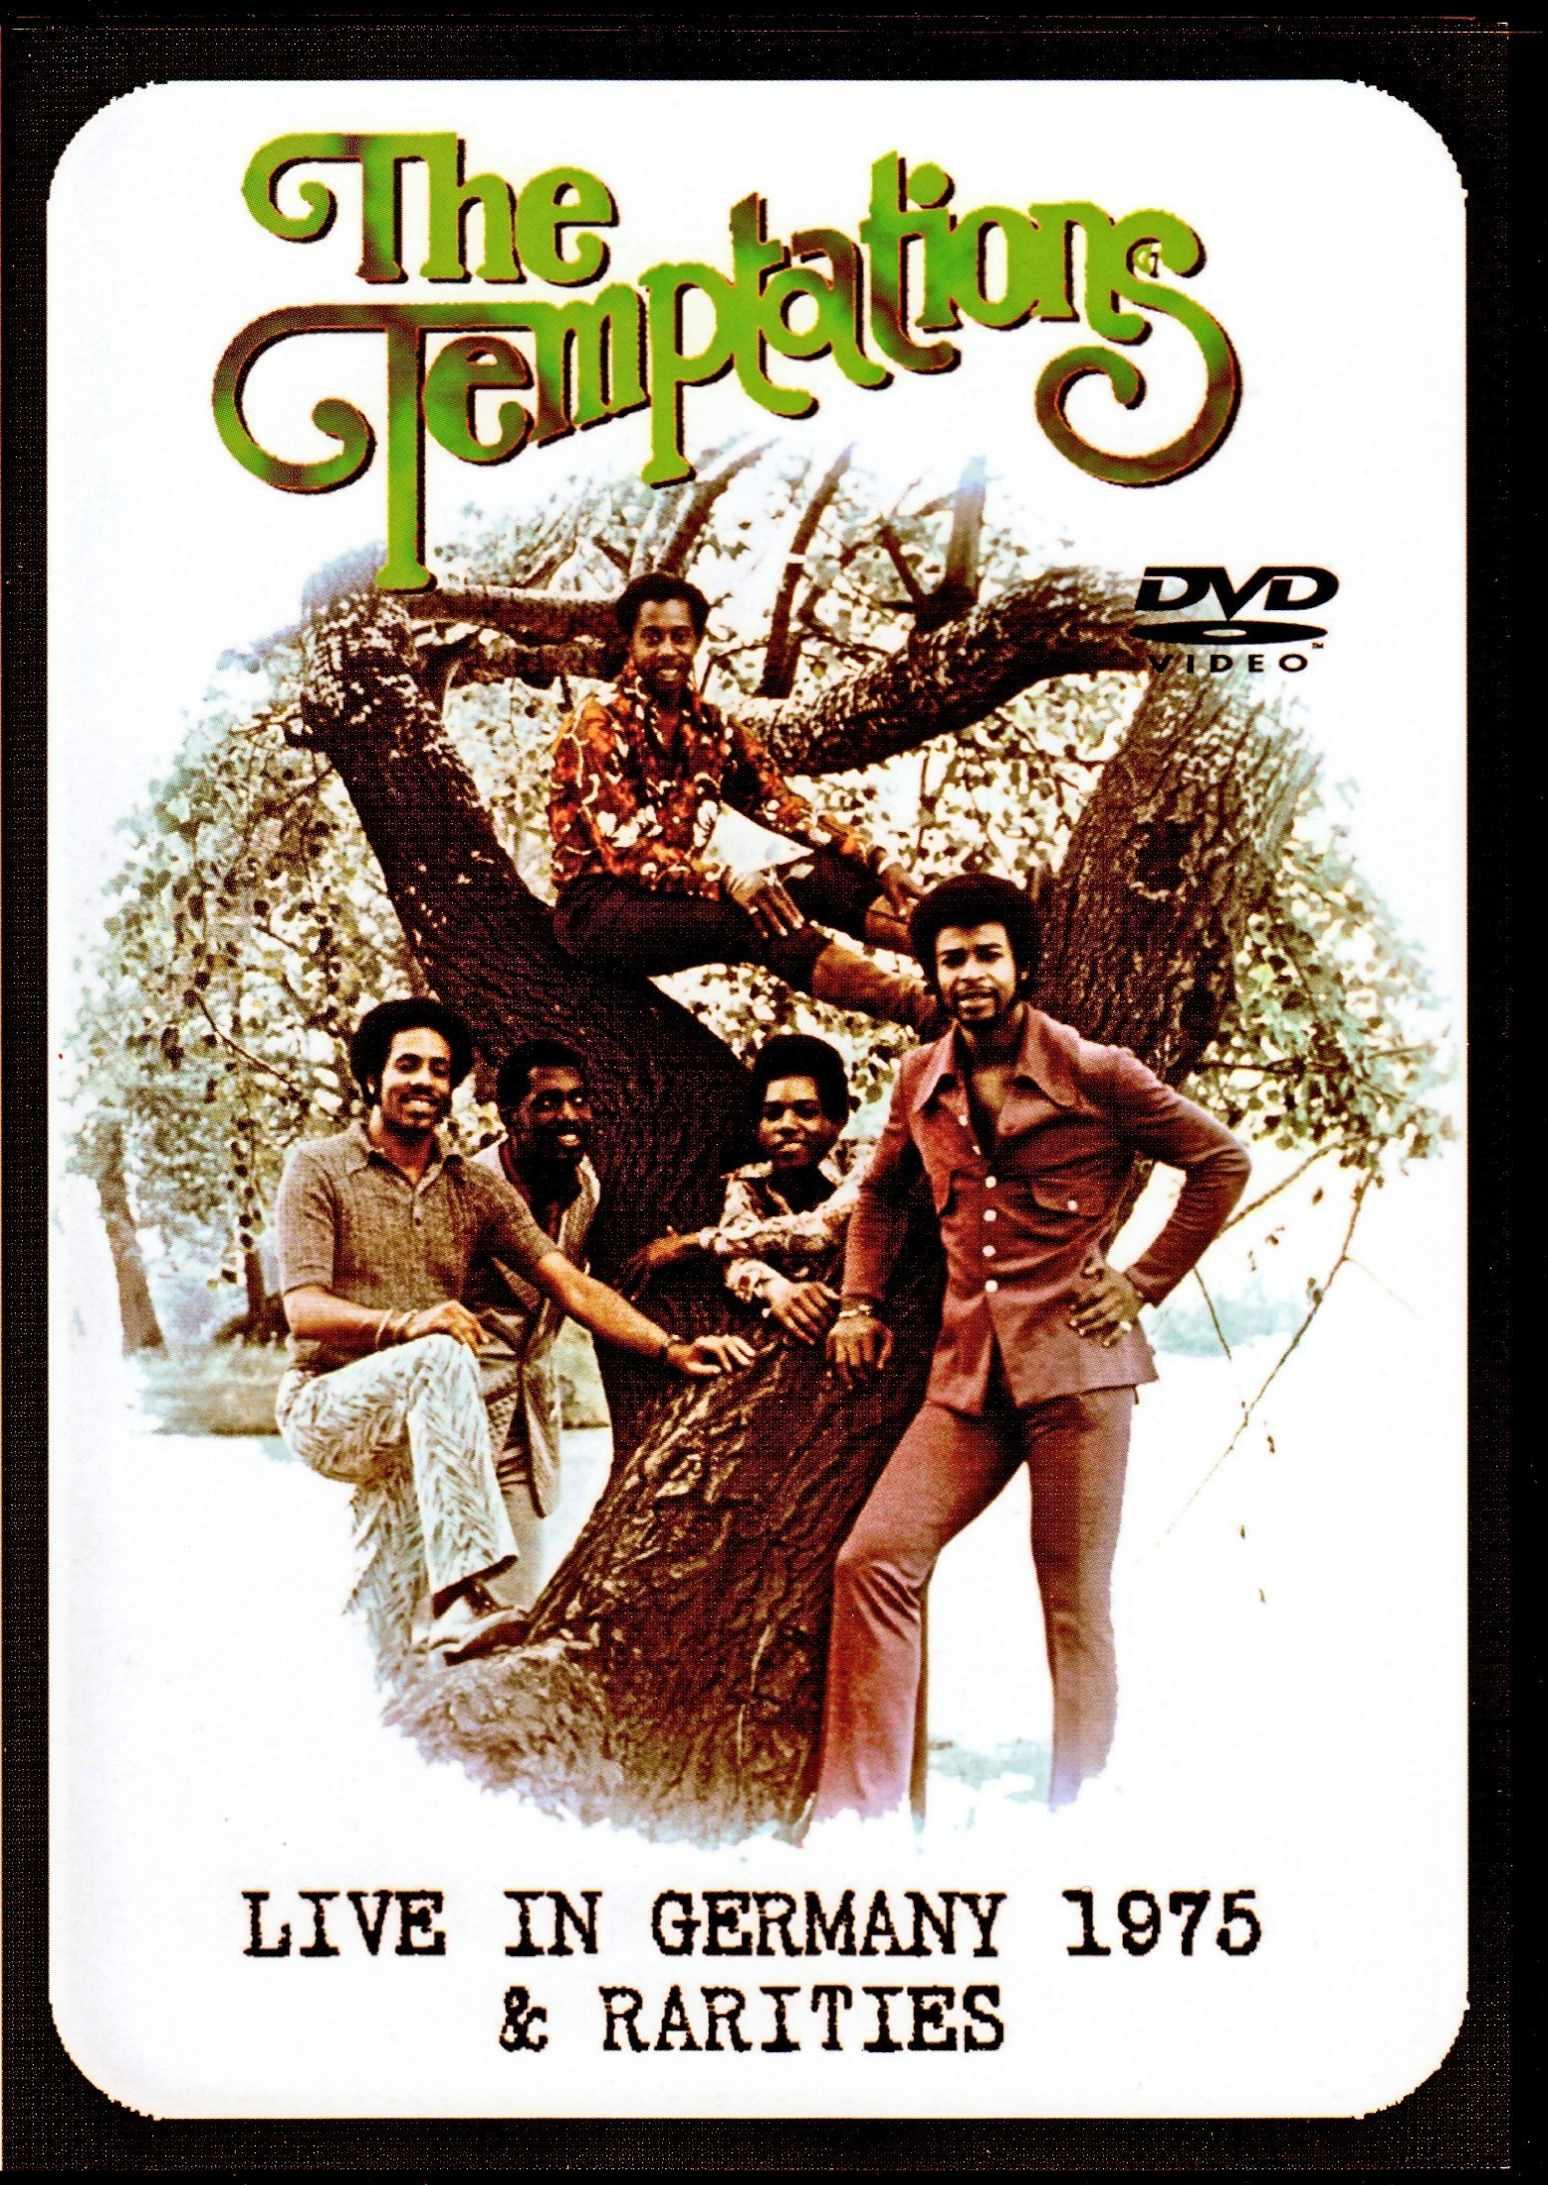 Temptations テンプテーションズ/Germany 1975 & more